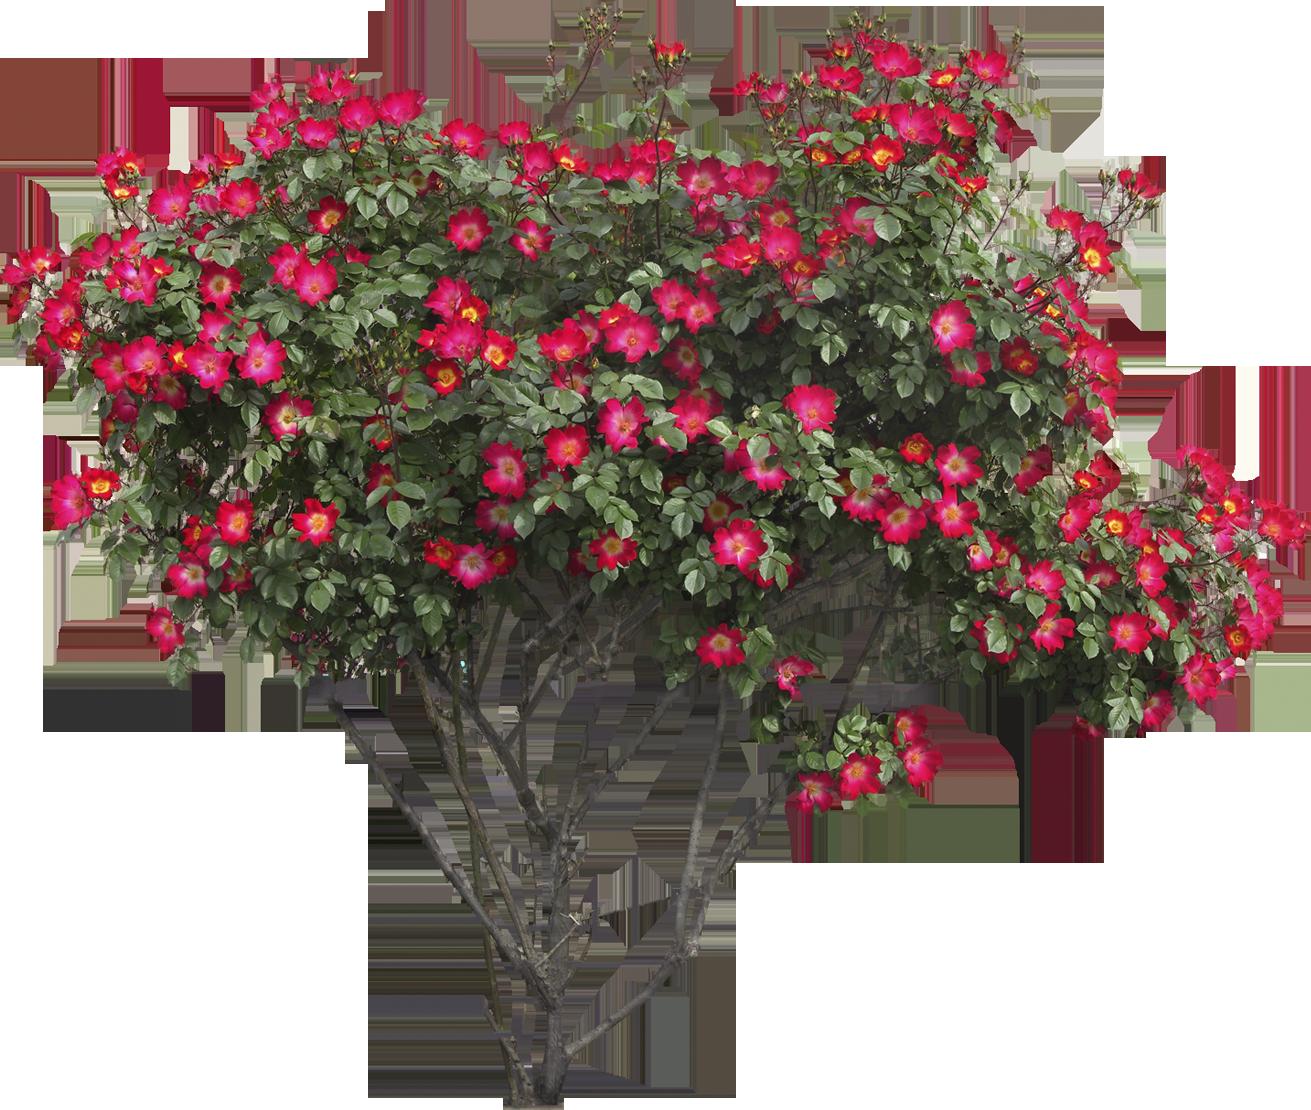 Flower bed png. Bushes images free download